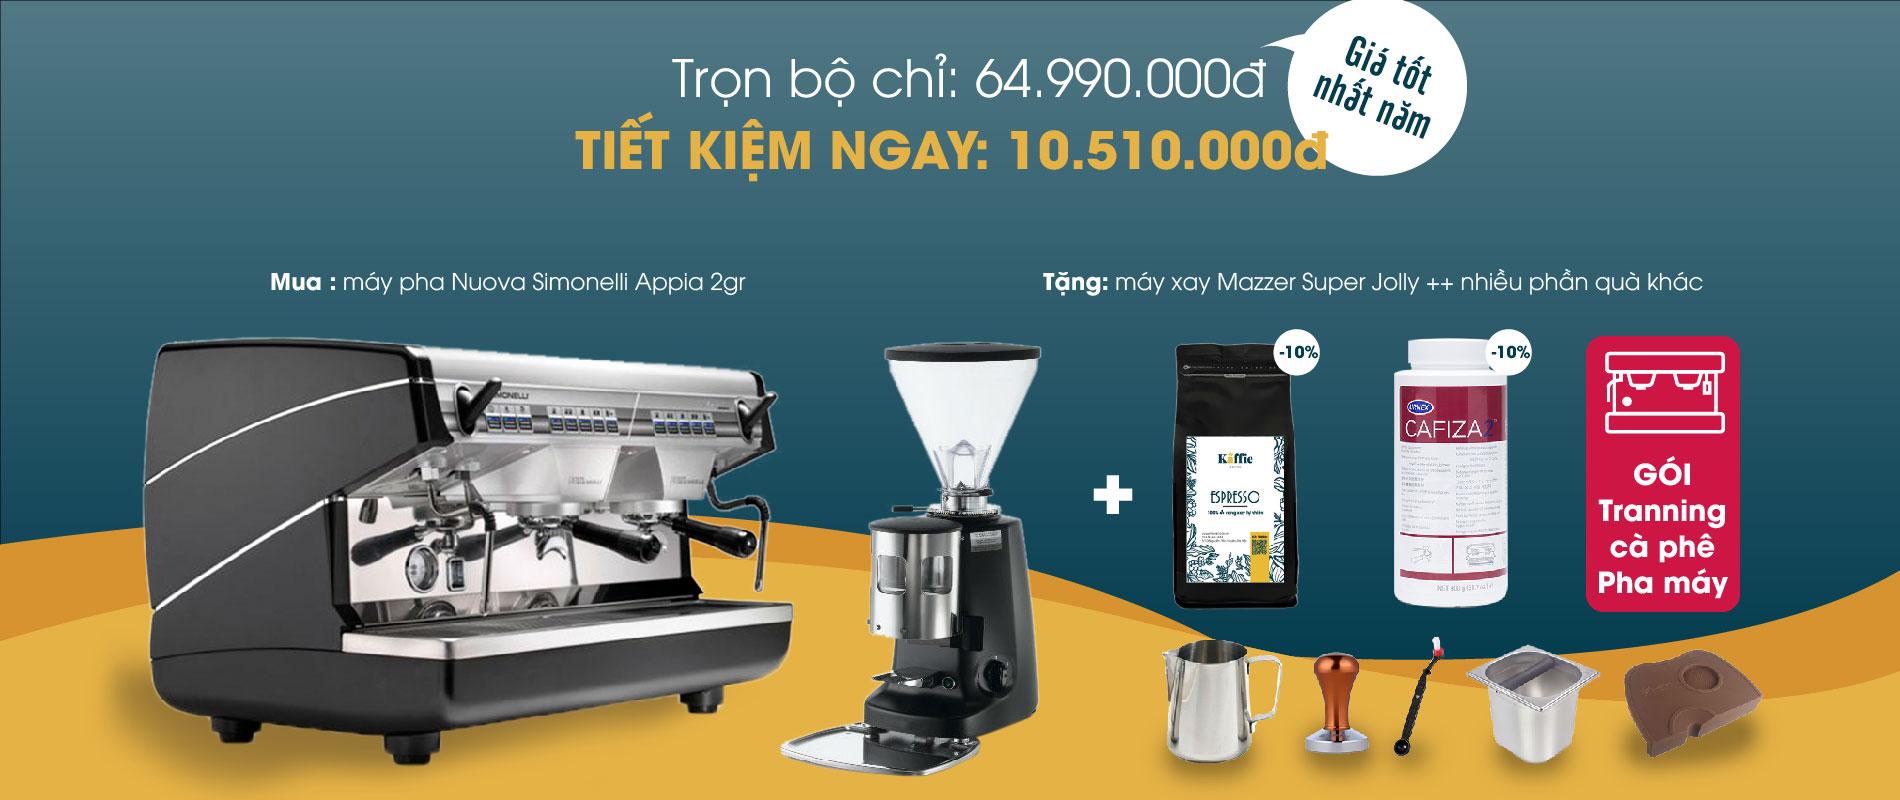 phinviet.com.vn